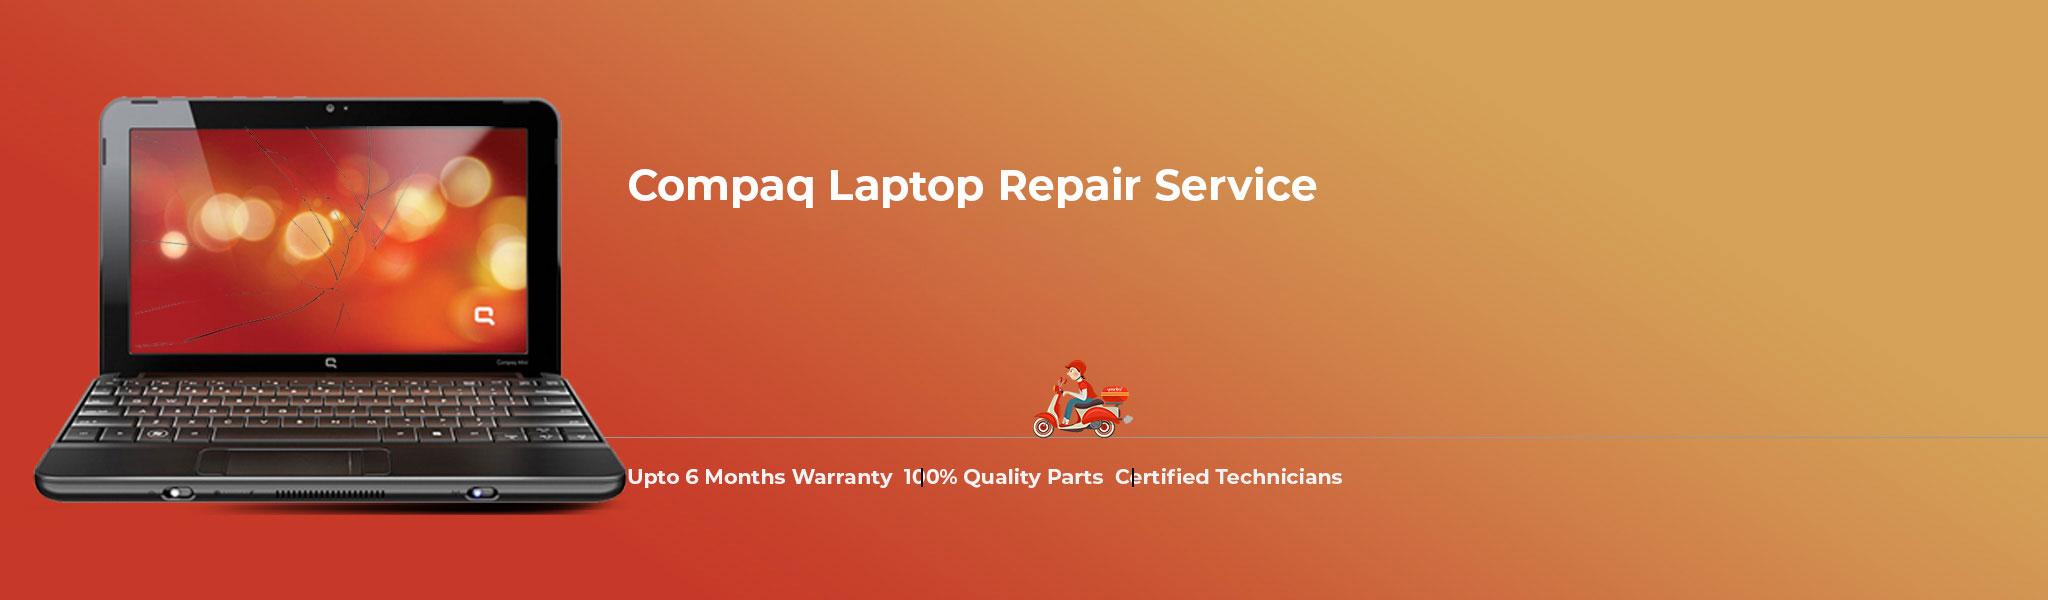 compaq-laptop-repair.jpg